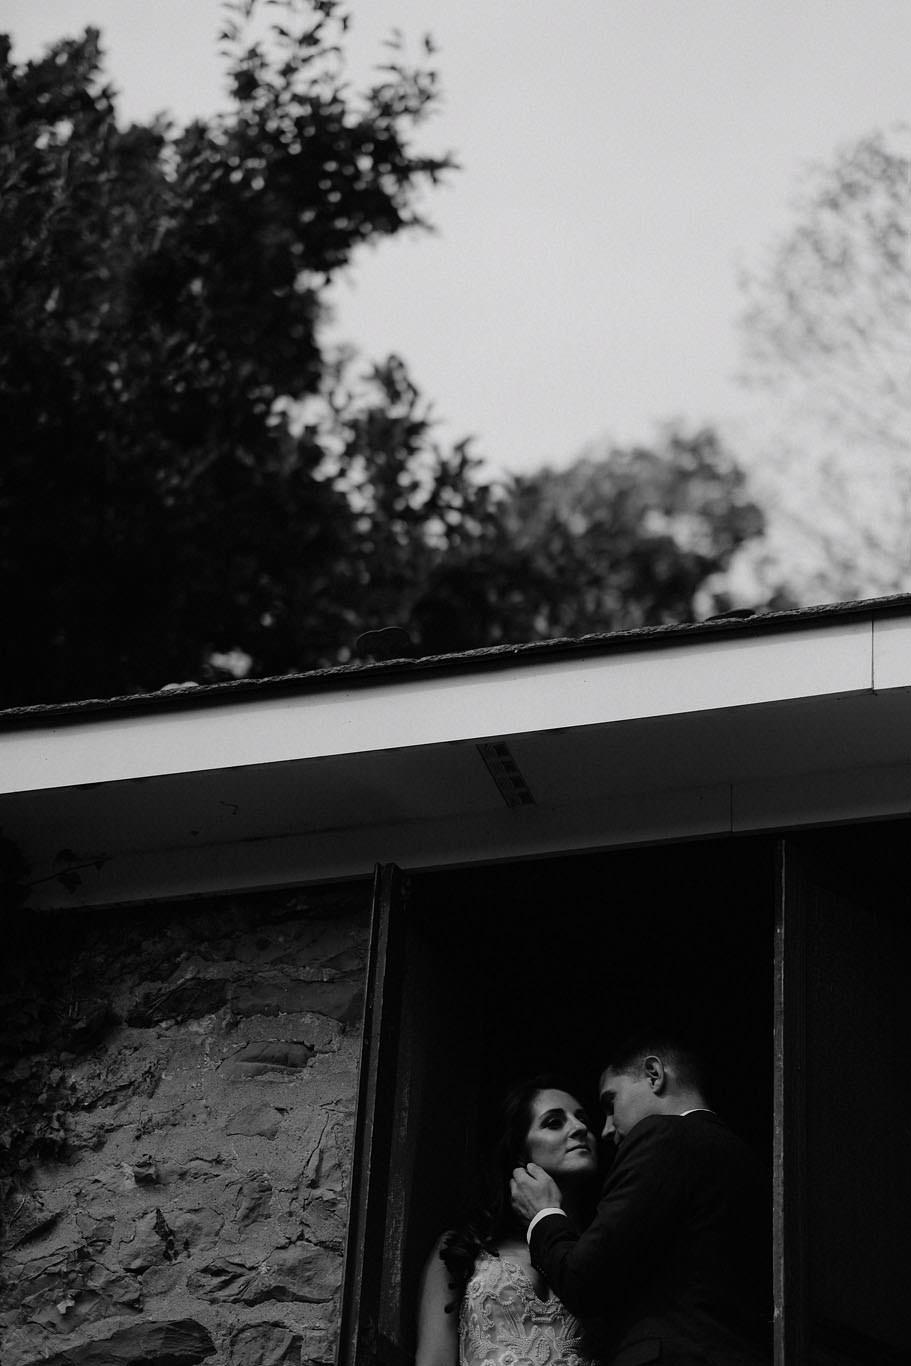 andover new jersey crossed keys estate adventure wedding photographer bride groom portrait window